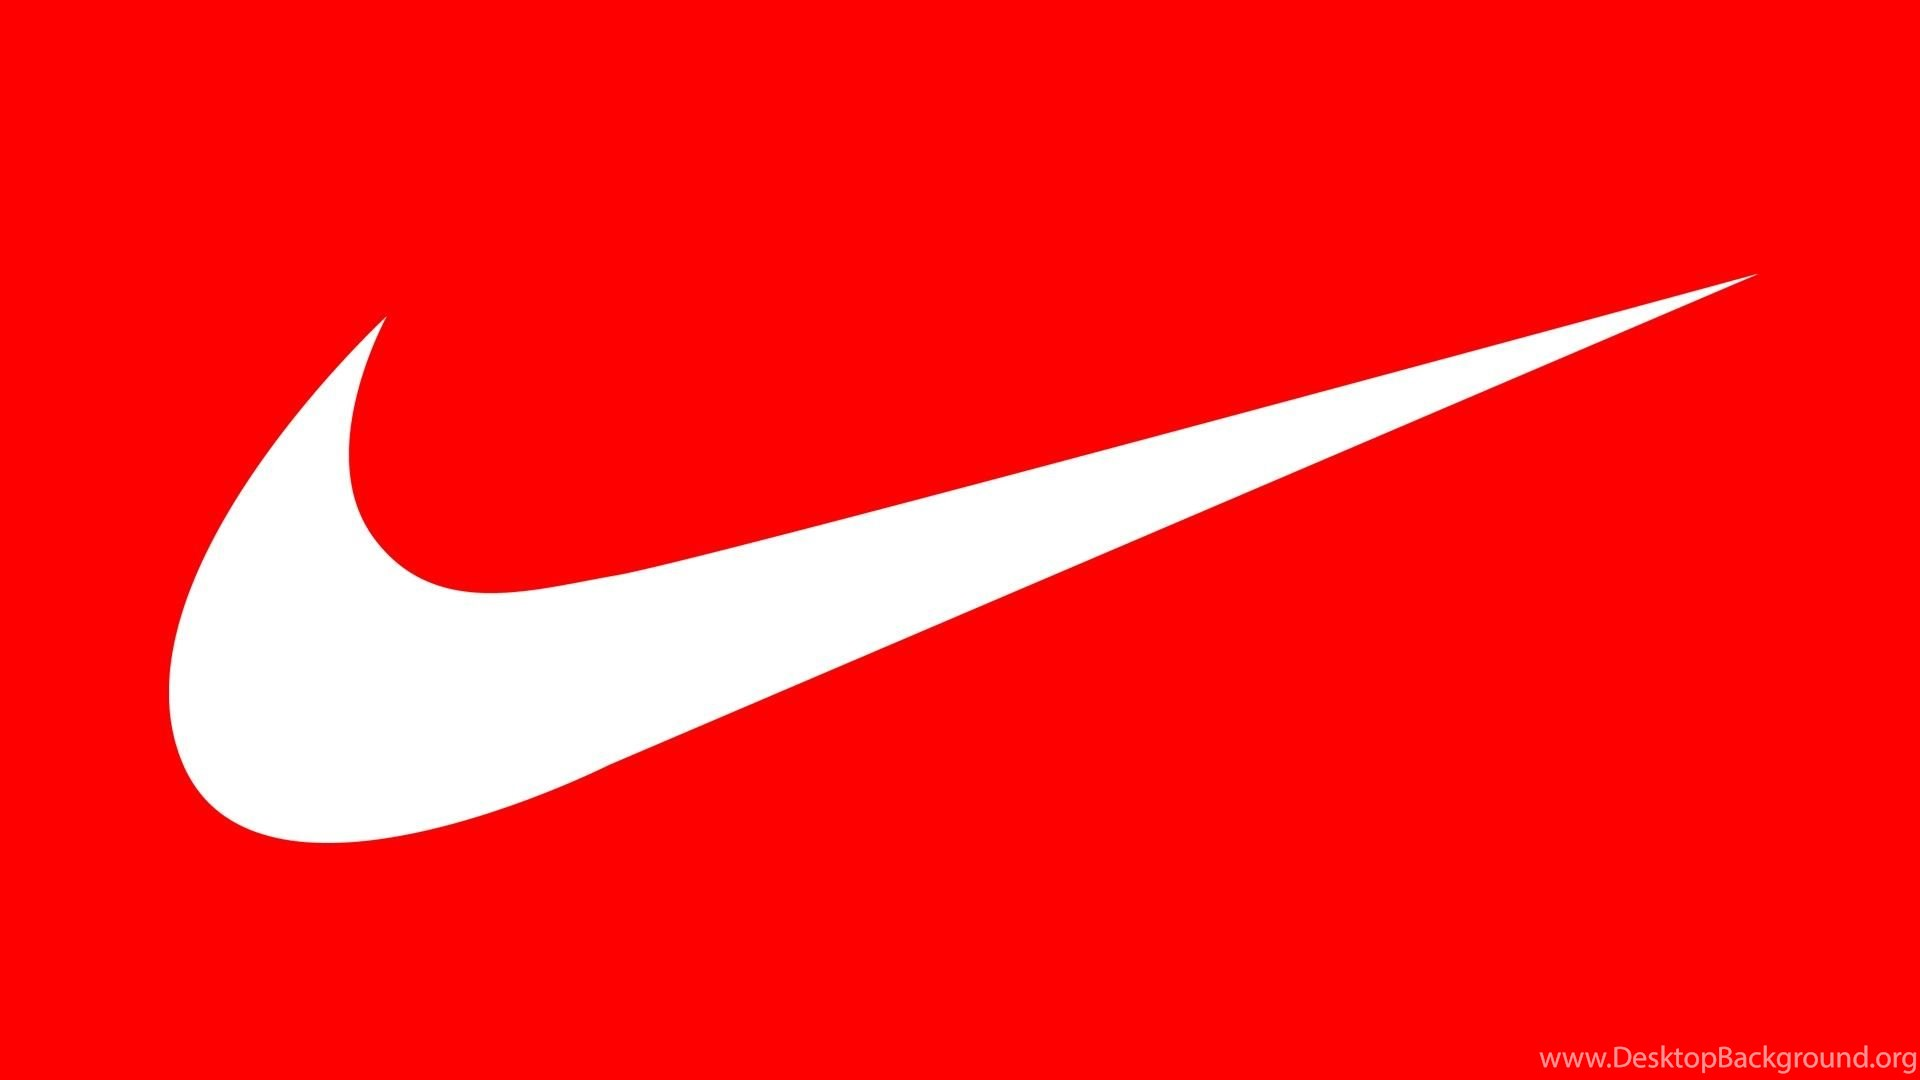 Nike Wallpapers Tumblr Desktop Backgrounds Background